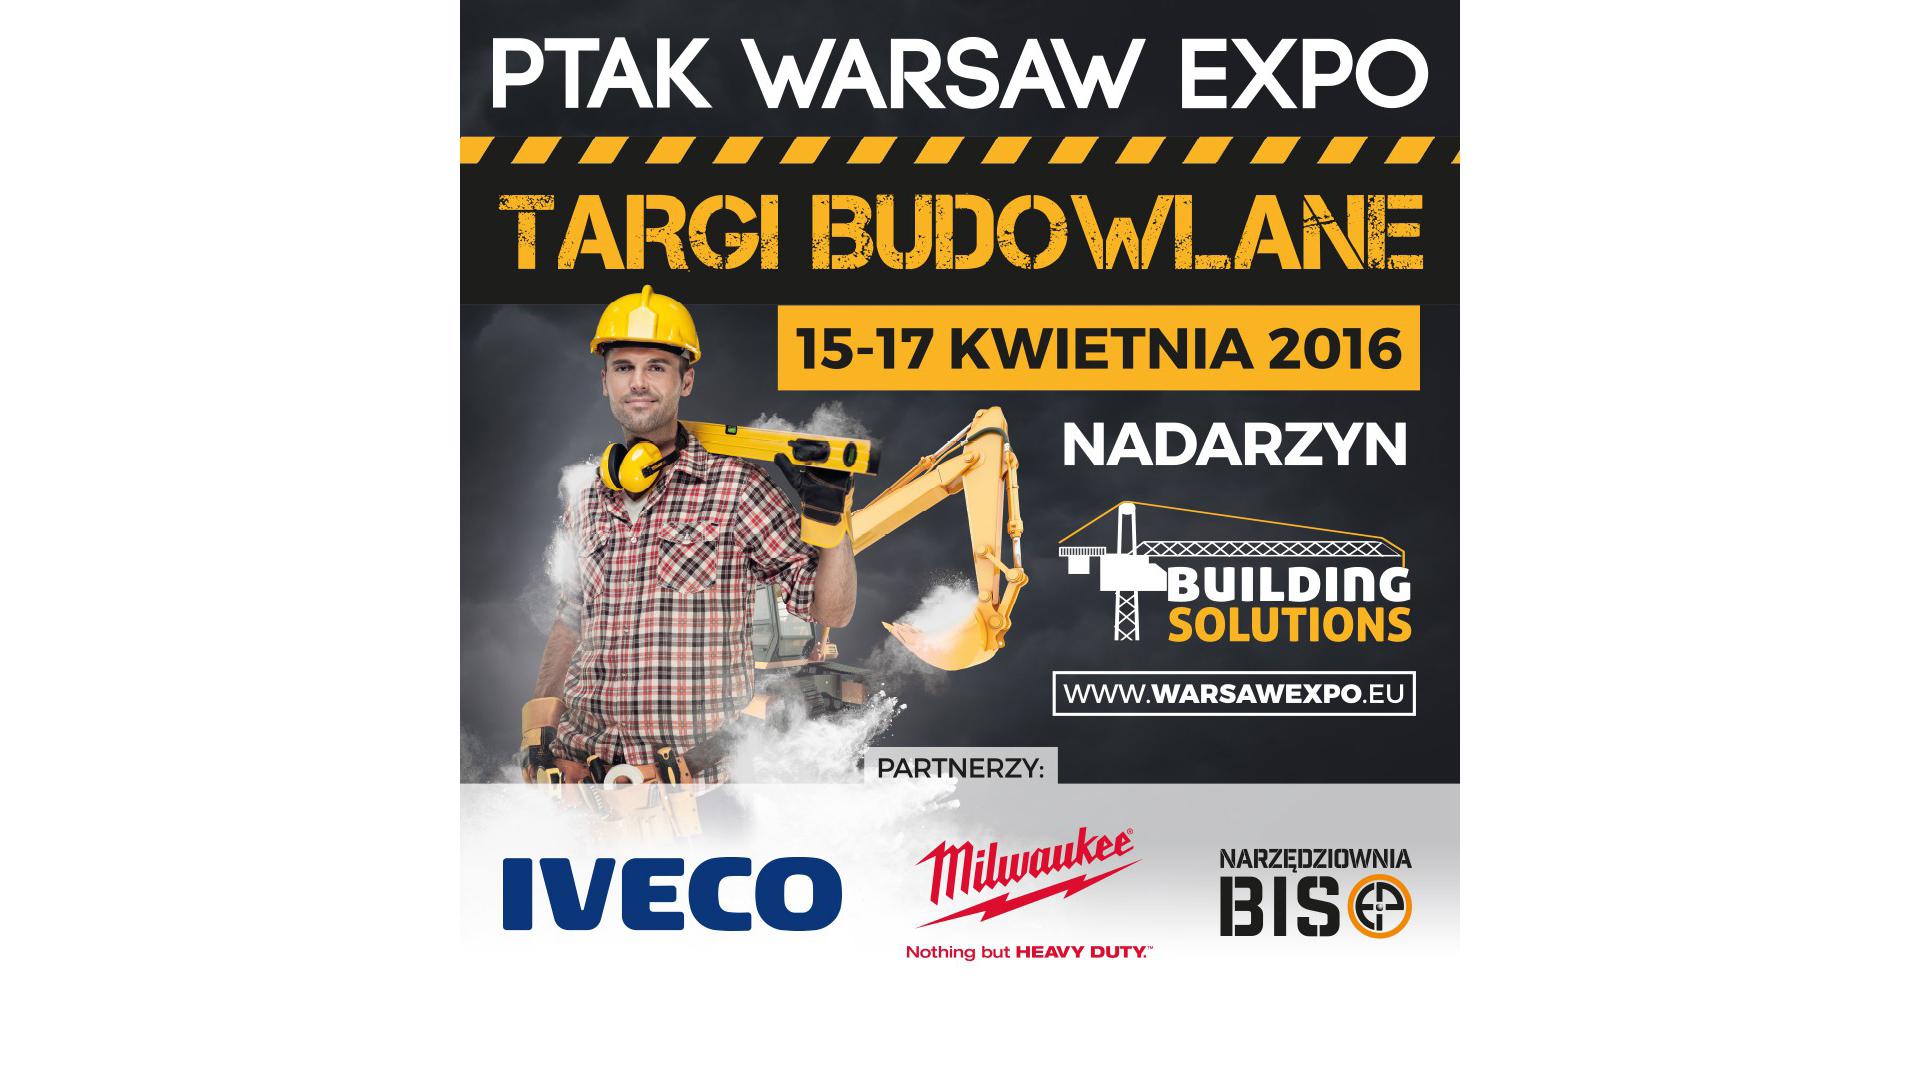 PTAK WARSAW EXPO Targi Budowlane – Nadarzyn 15-17.04